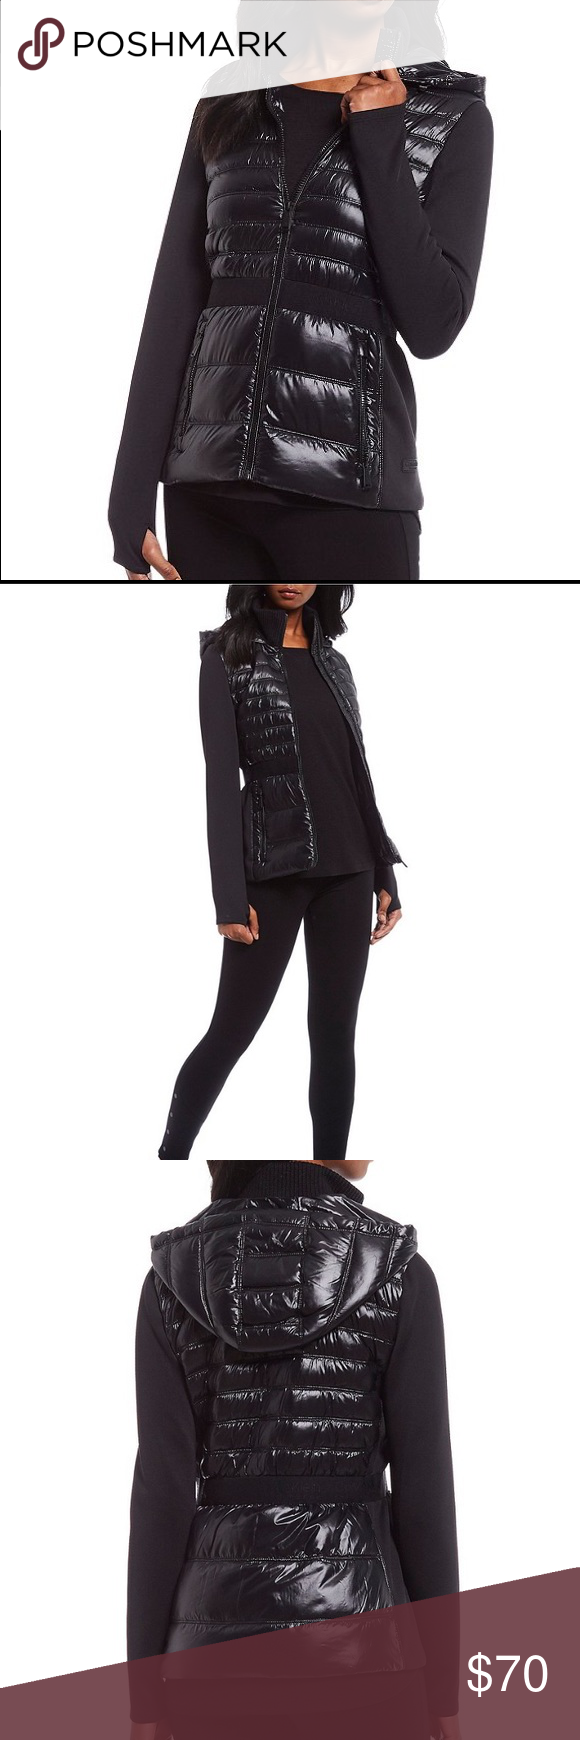 Calvin Klein Puffer Jacket in 2020 Jackets, Puffer